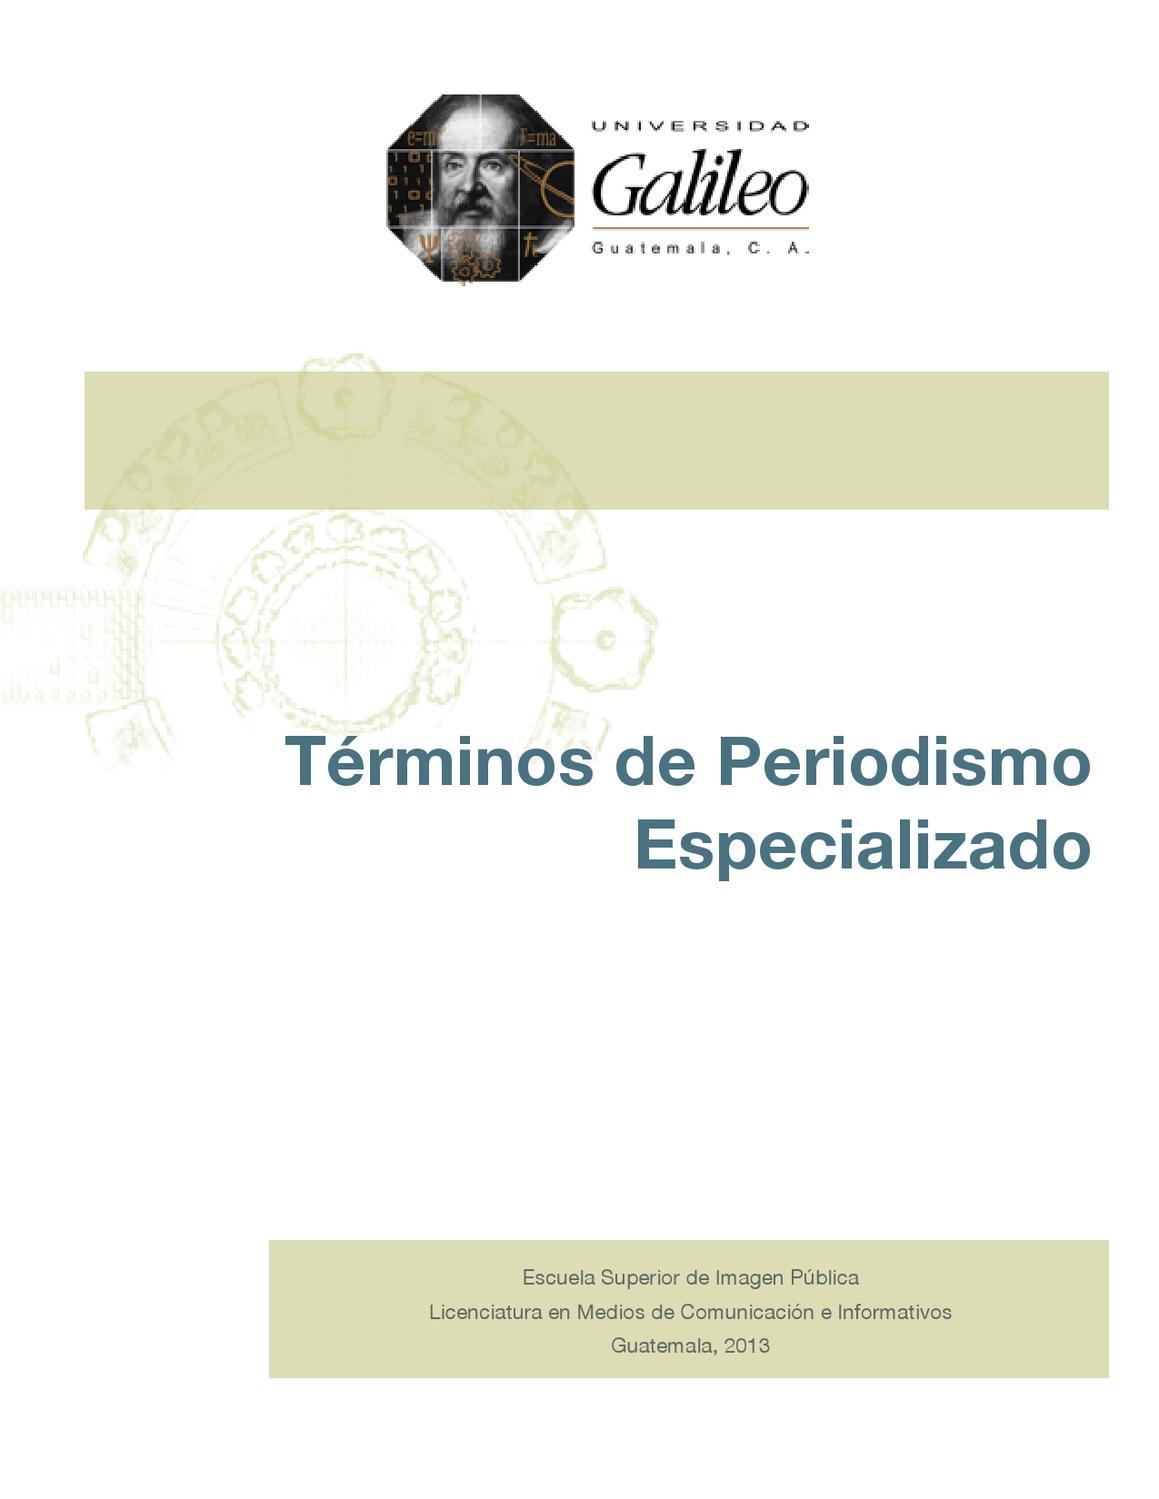 Términos de Periodismo Especializado by Universidad Galileo - issuu